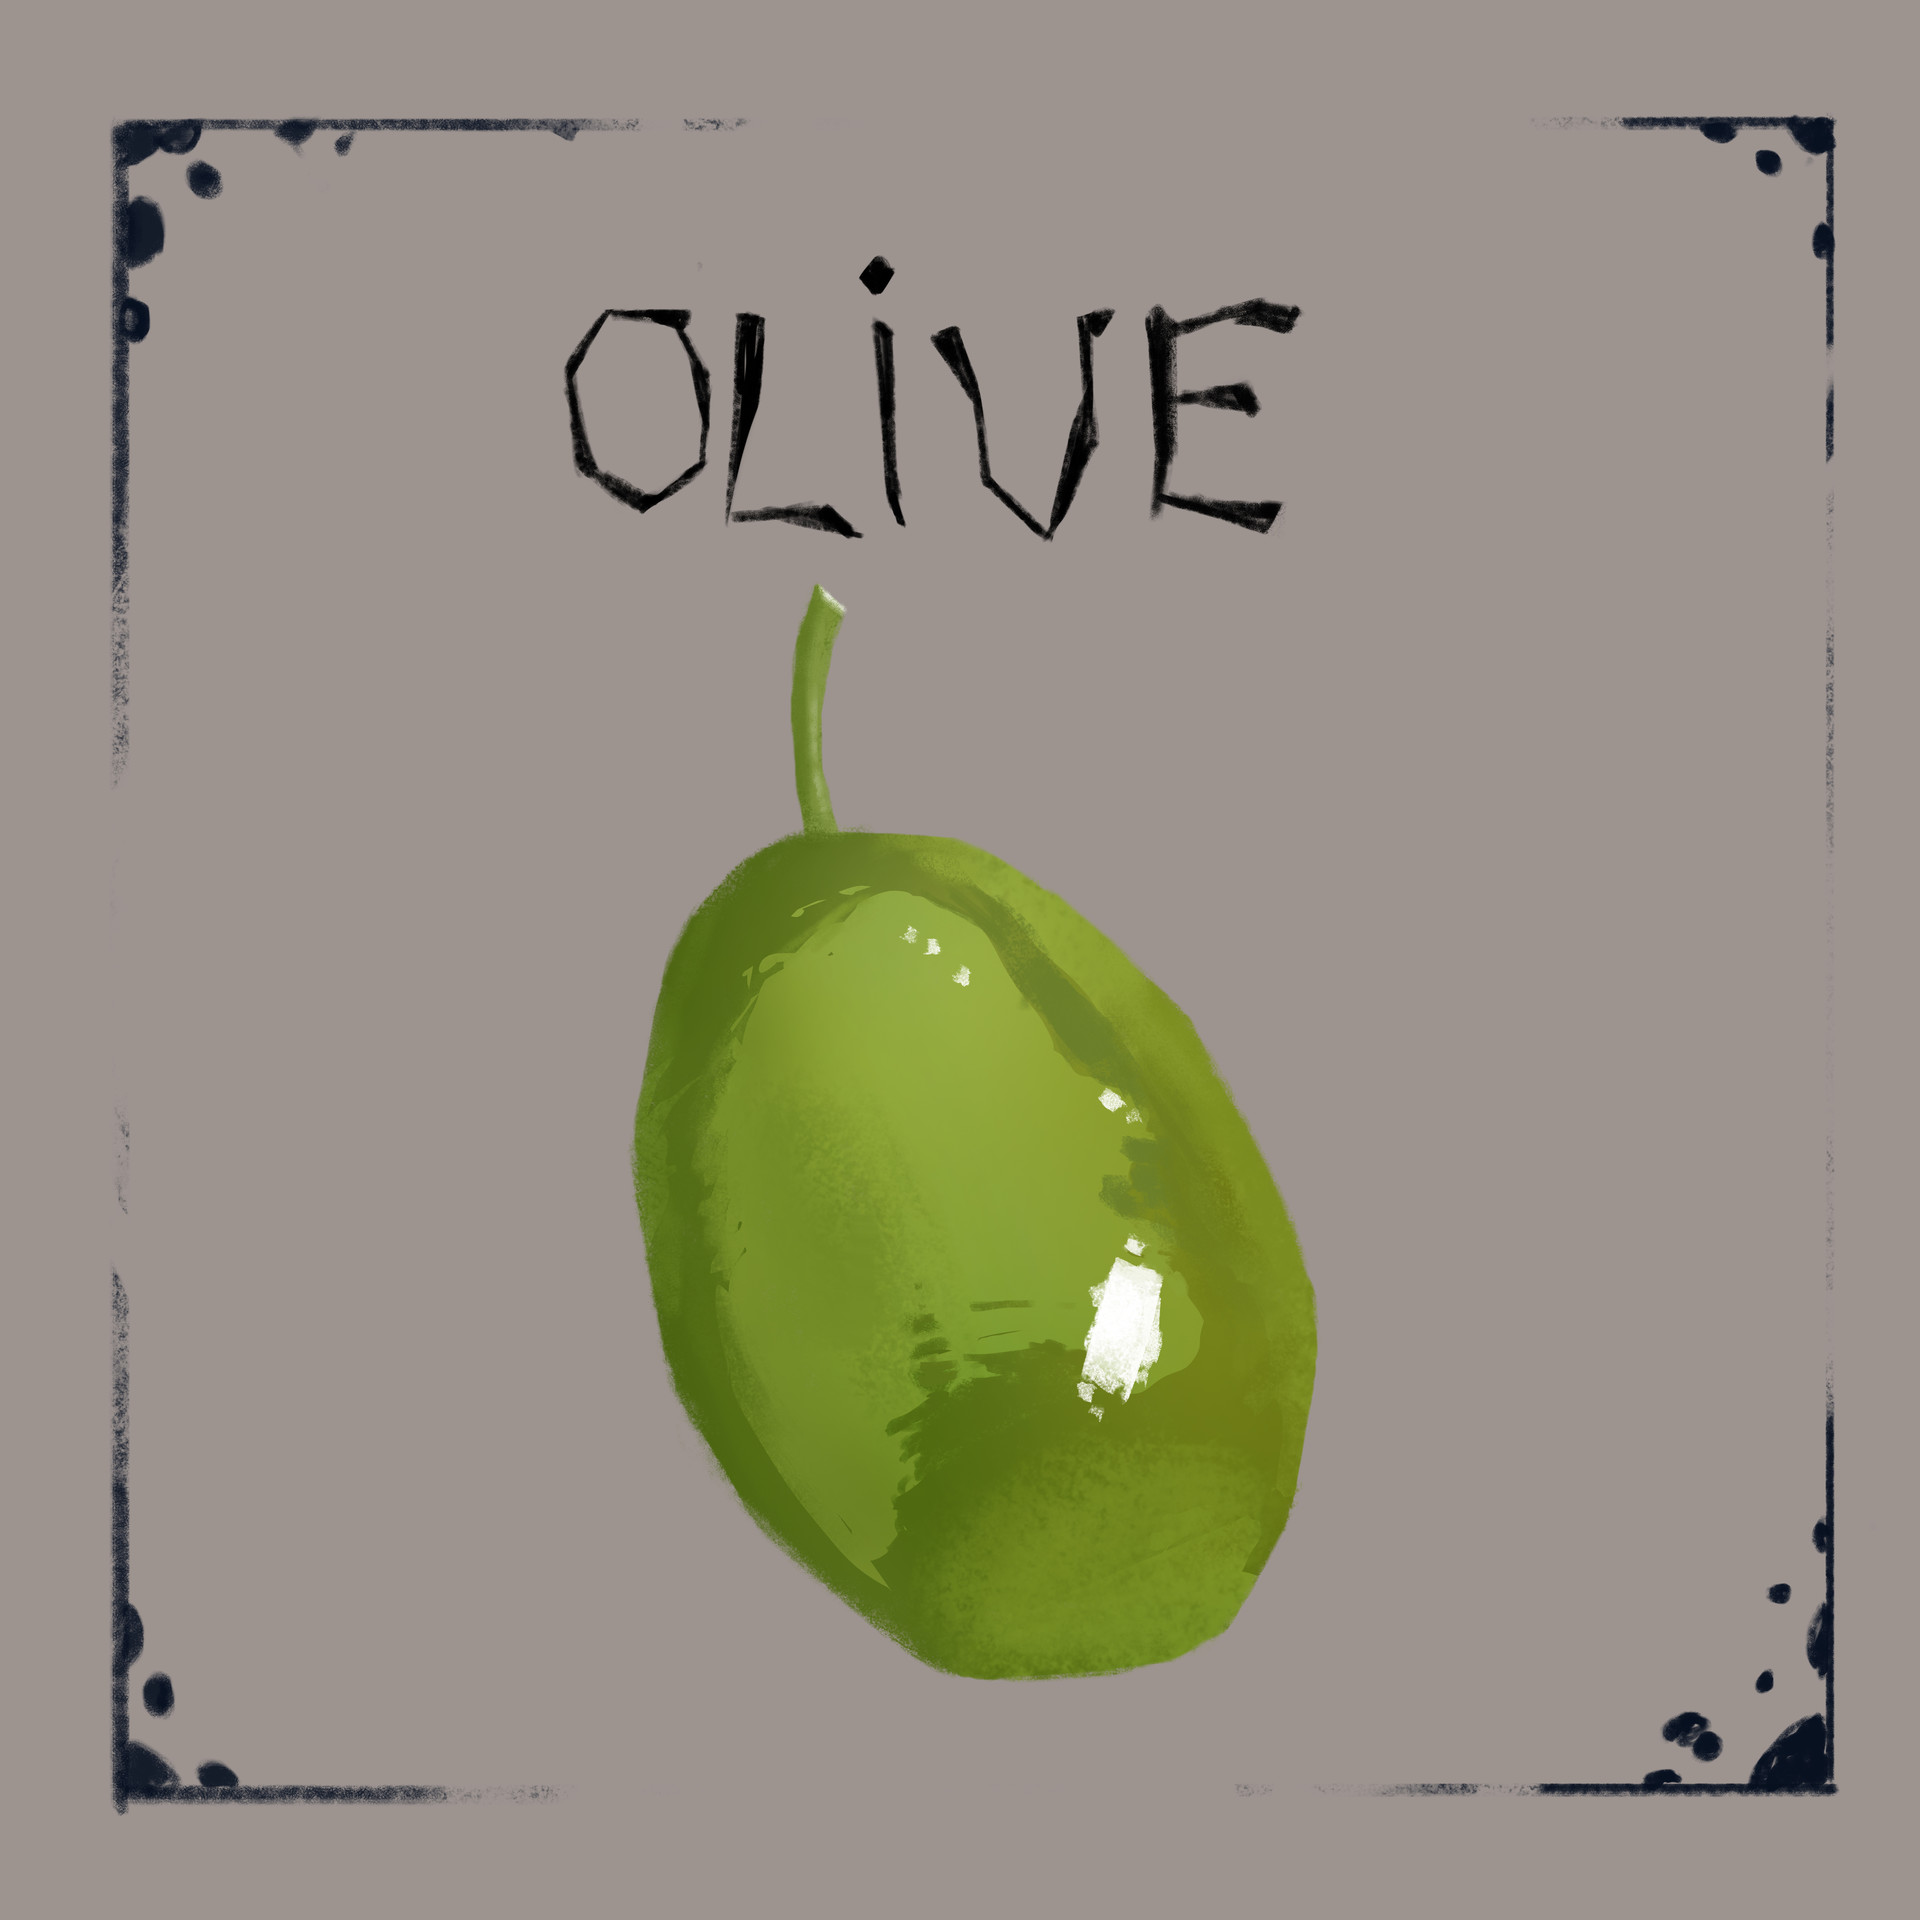 Michael loos olive